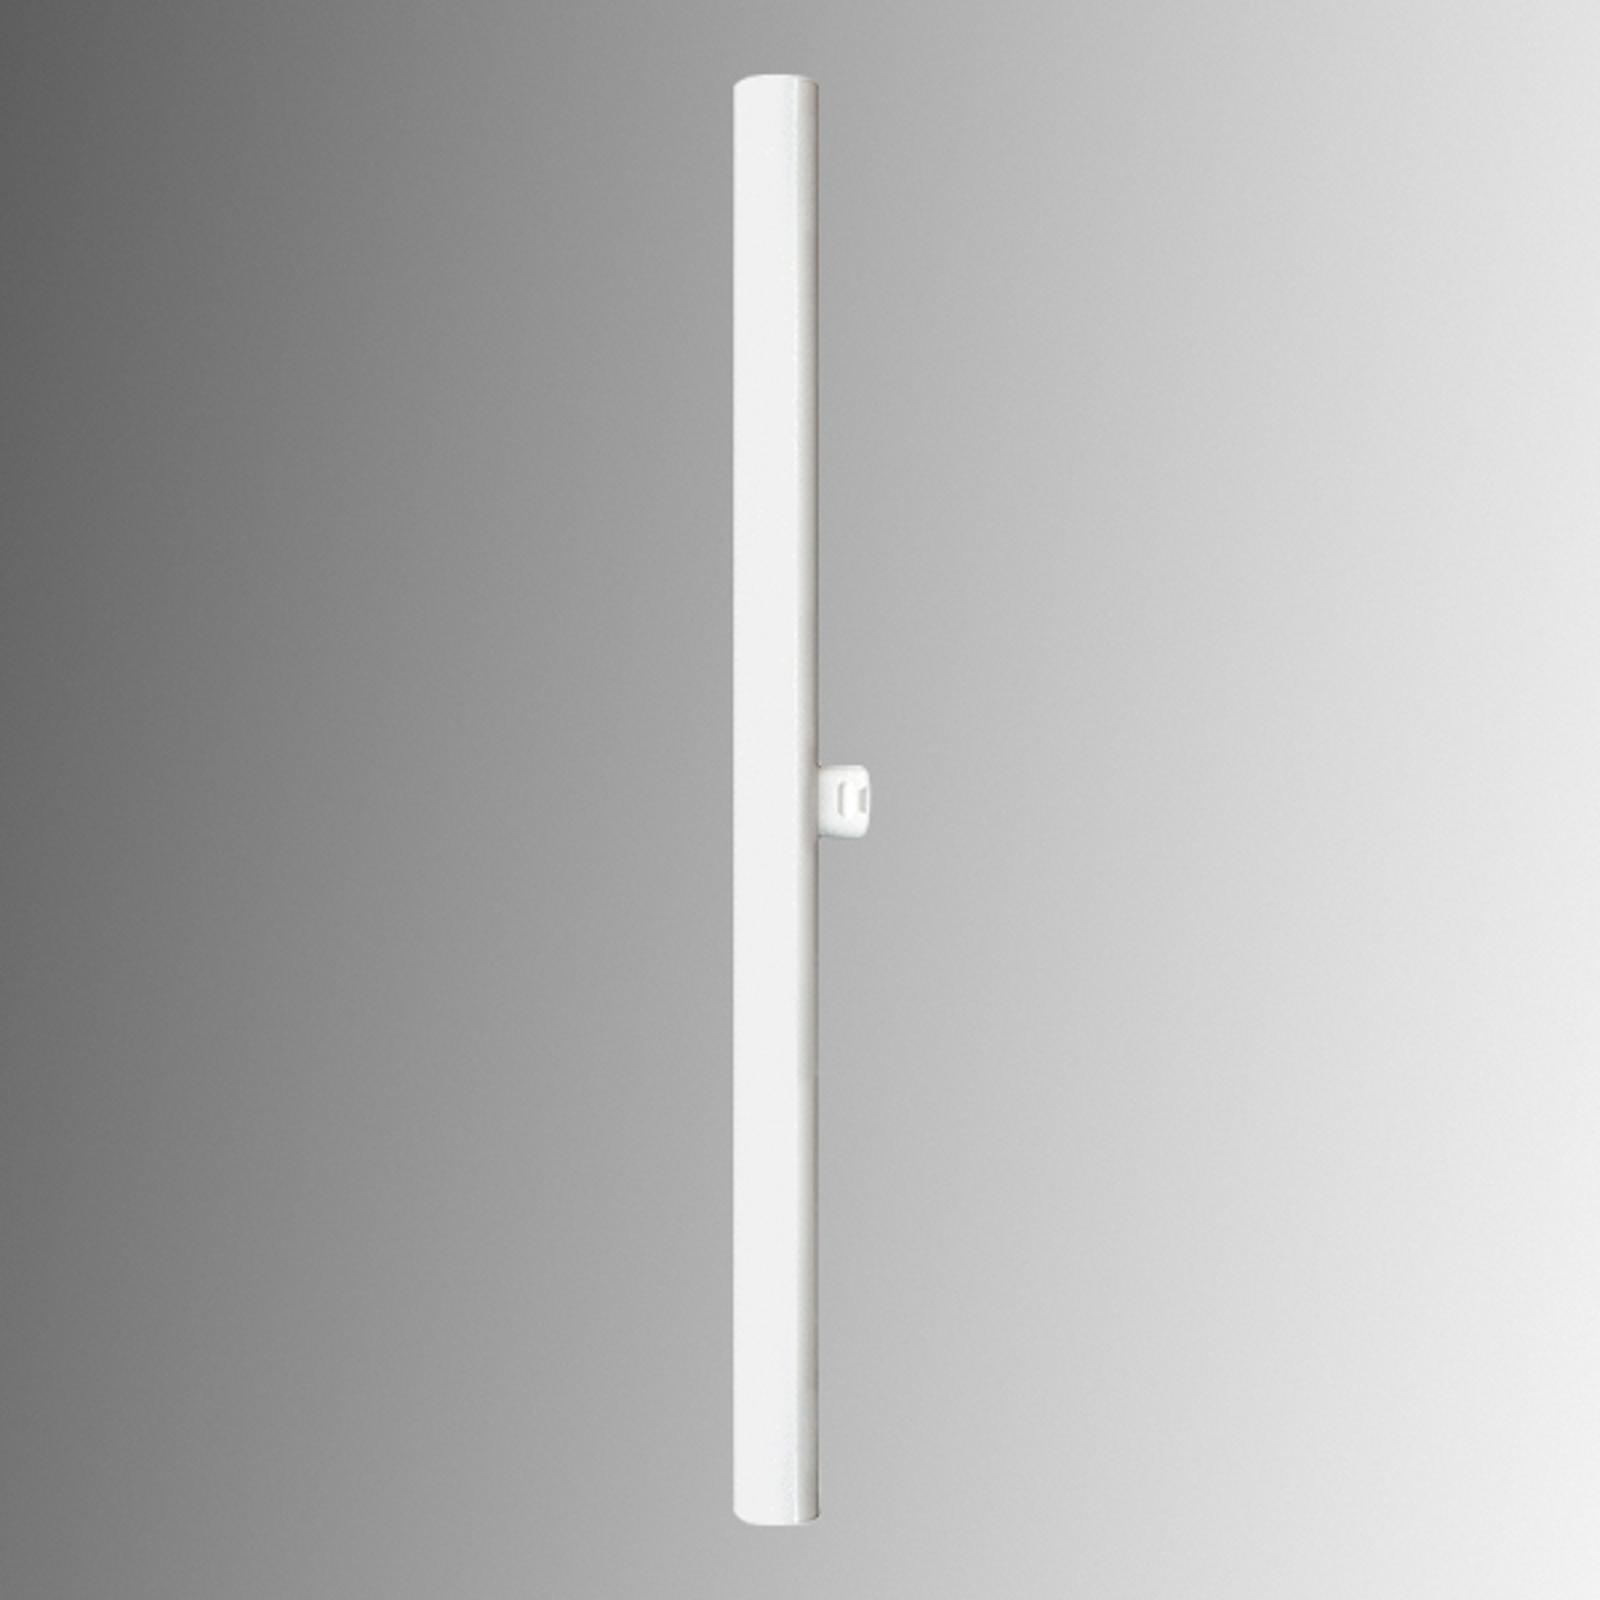 S14d 8W 927 HD LED-Linienlampe